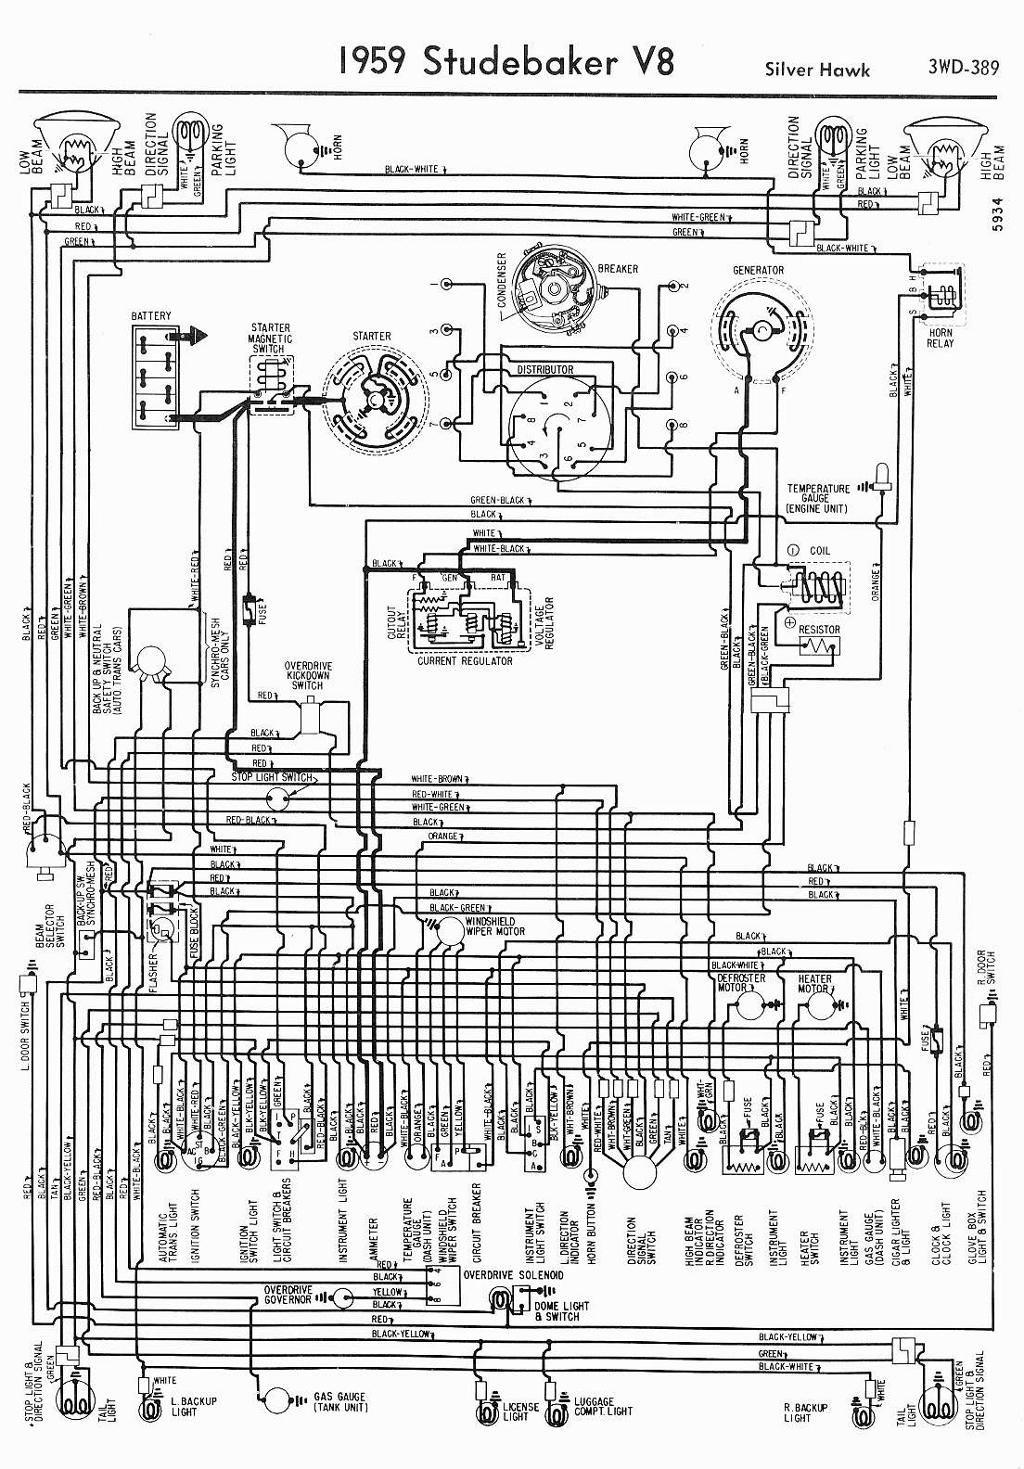 small resolution of studebaker engine diagrams wiring diagram data val related image studebaker blueprints drawings diagram 1954